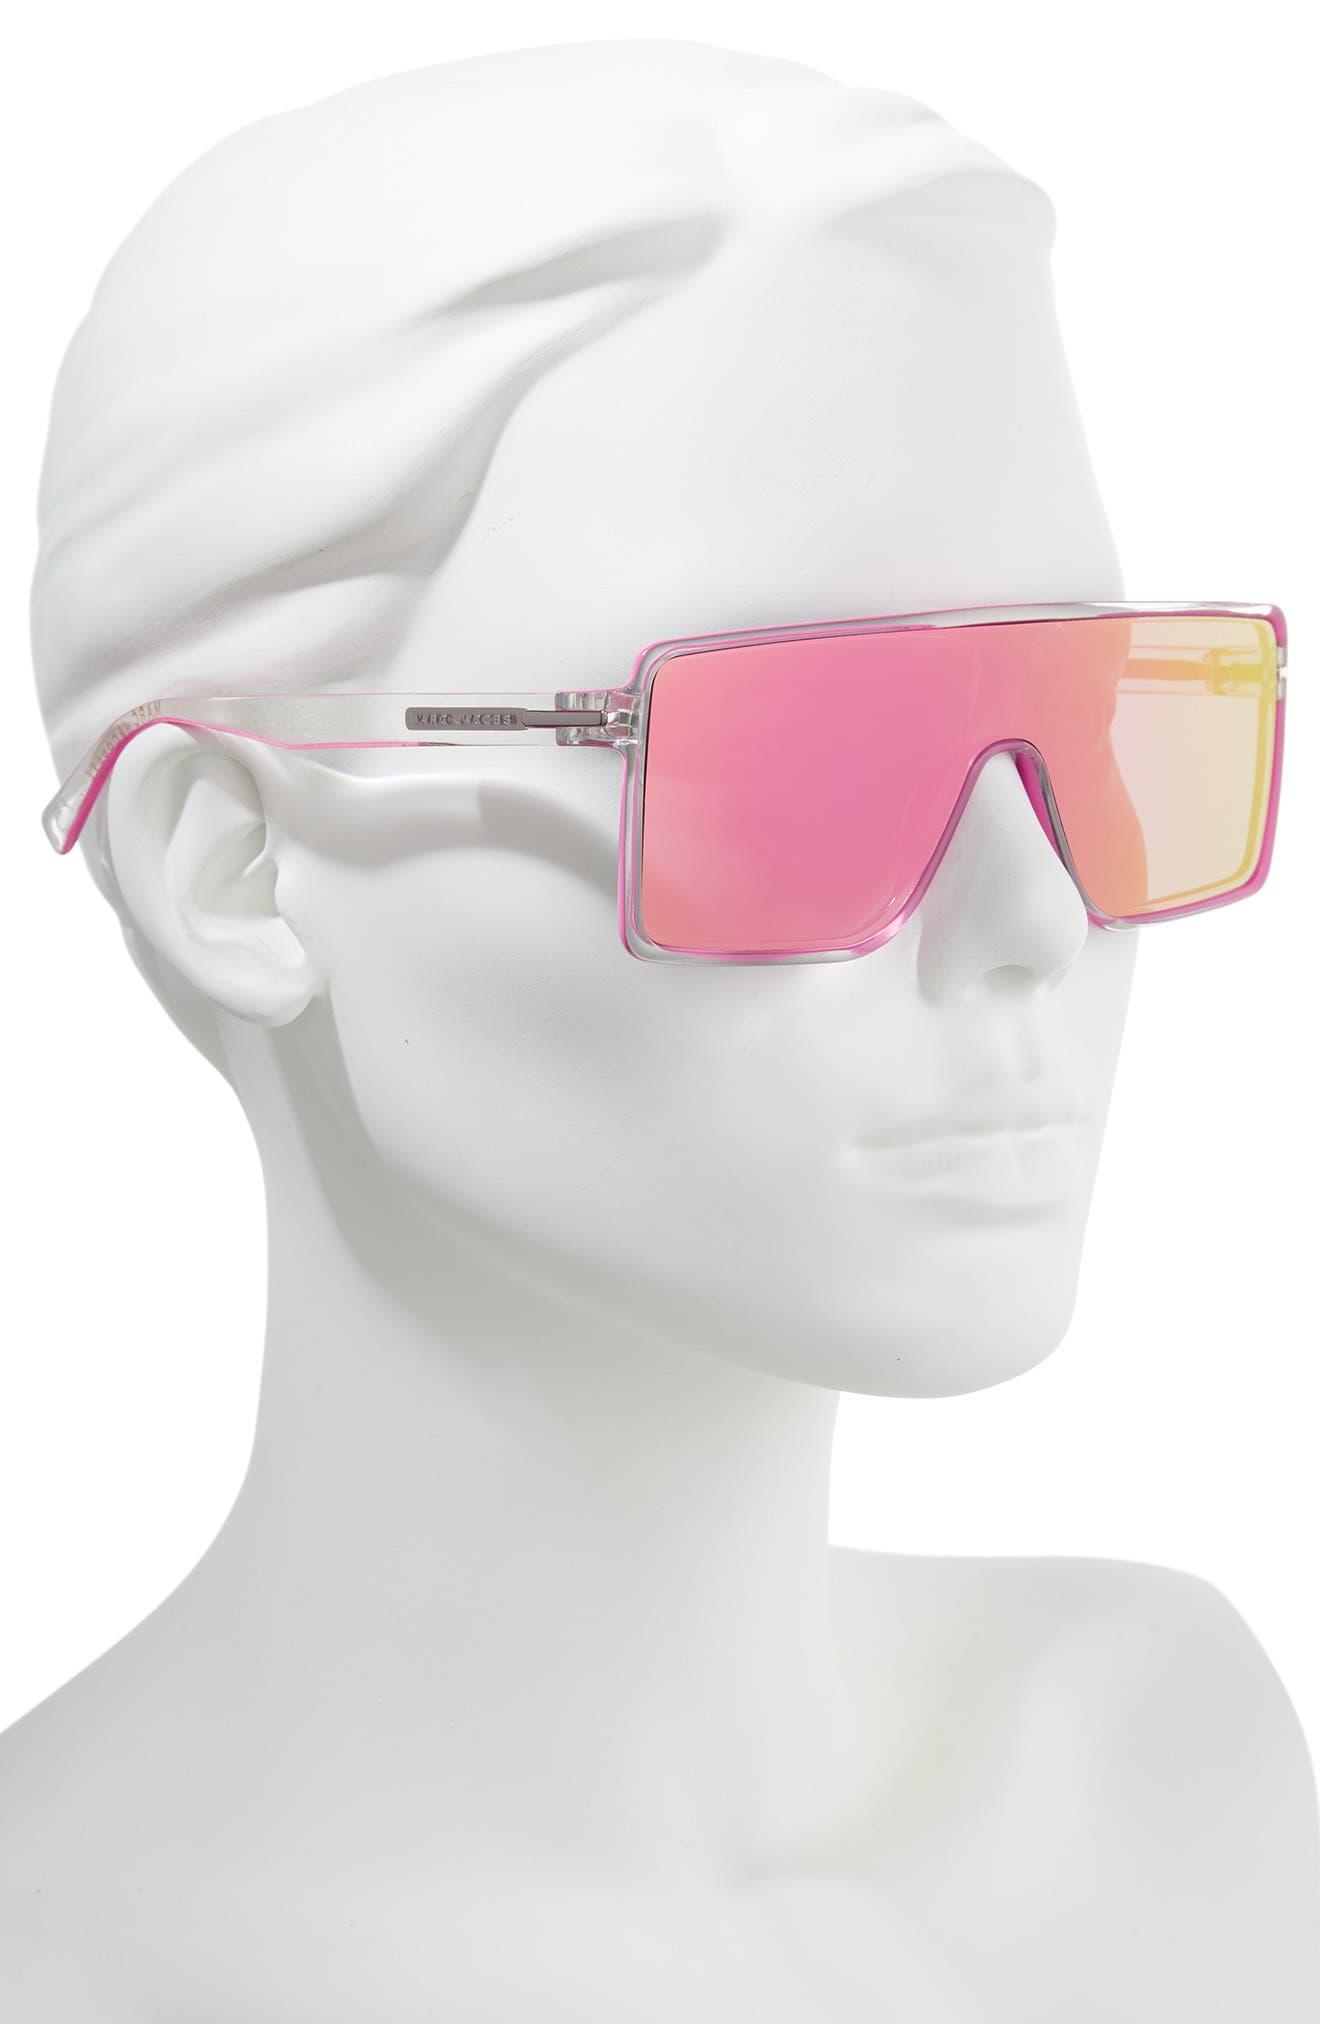 54mm Shield Sunglasses,                             Alternate thumbnail 2, color,                             Crystal Pink